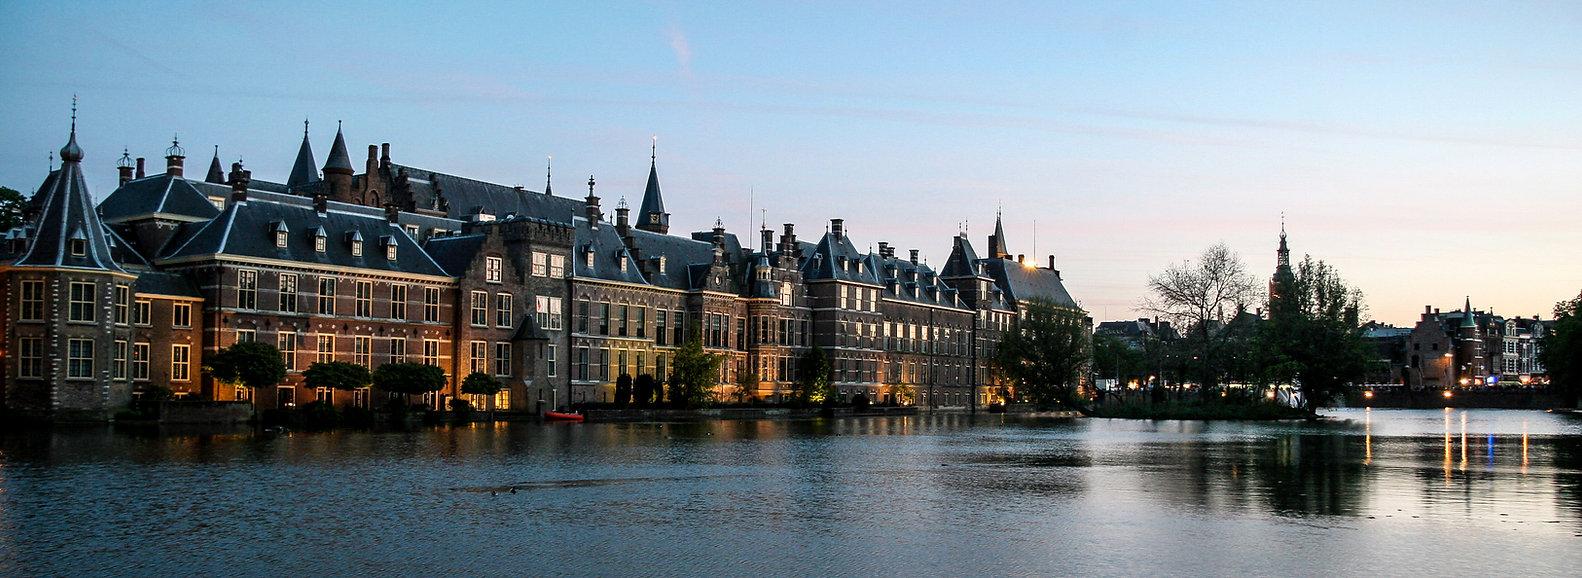 Hague-parliament-daytime-Open-Source.jpg